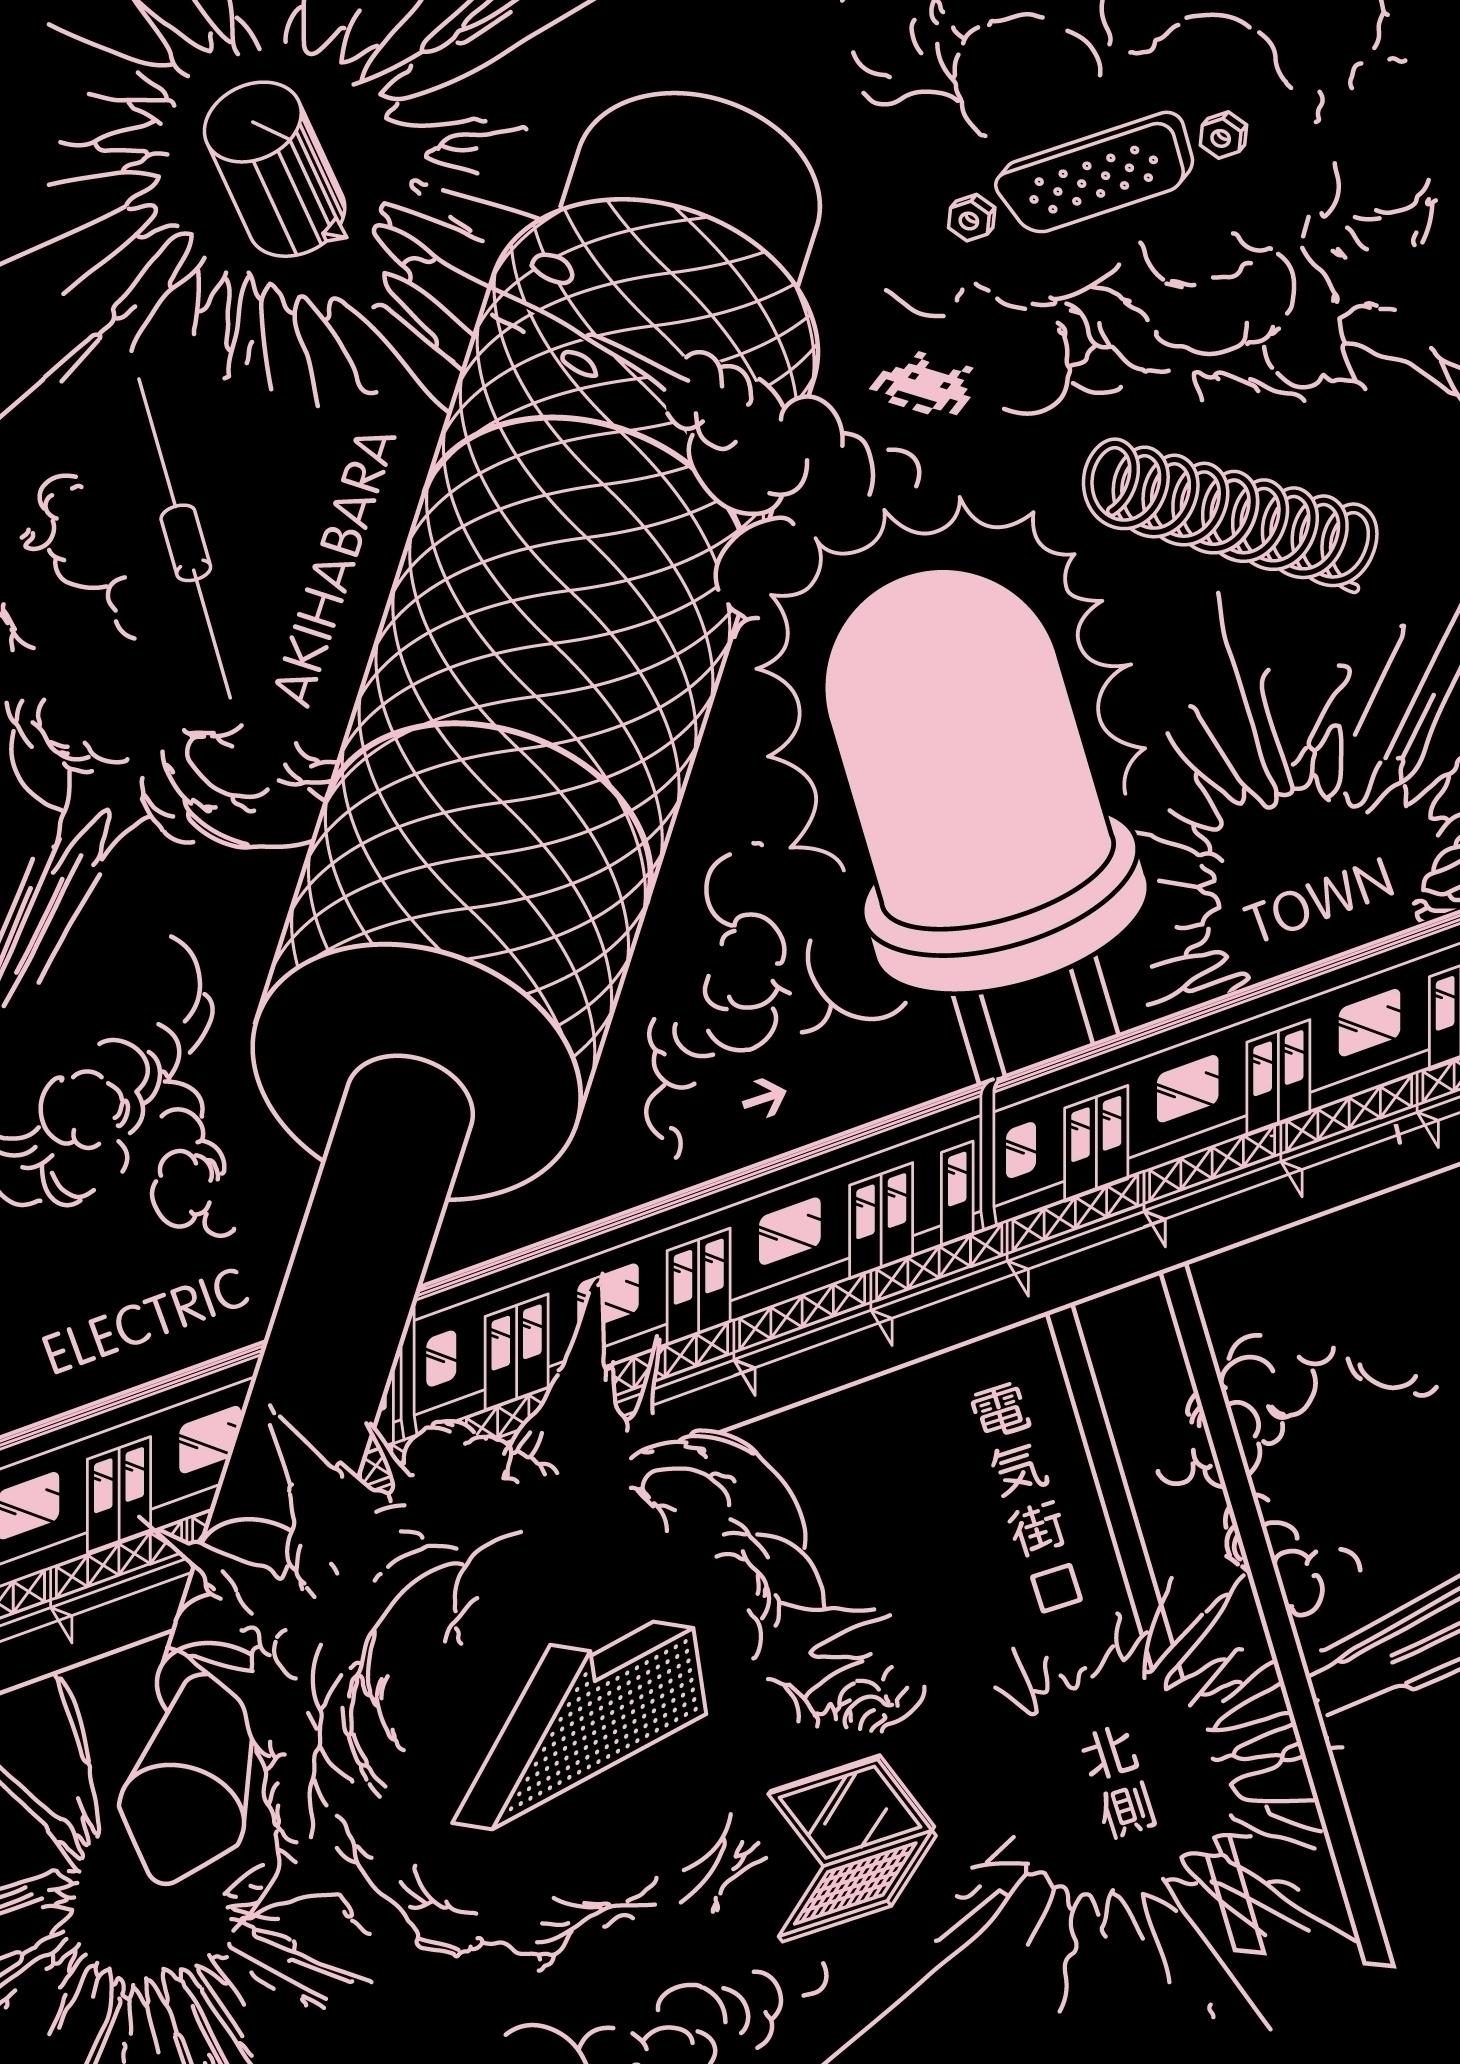 Poster YY01 Akihabara - 秋葉原 Yam - wulffgraphics | ello